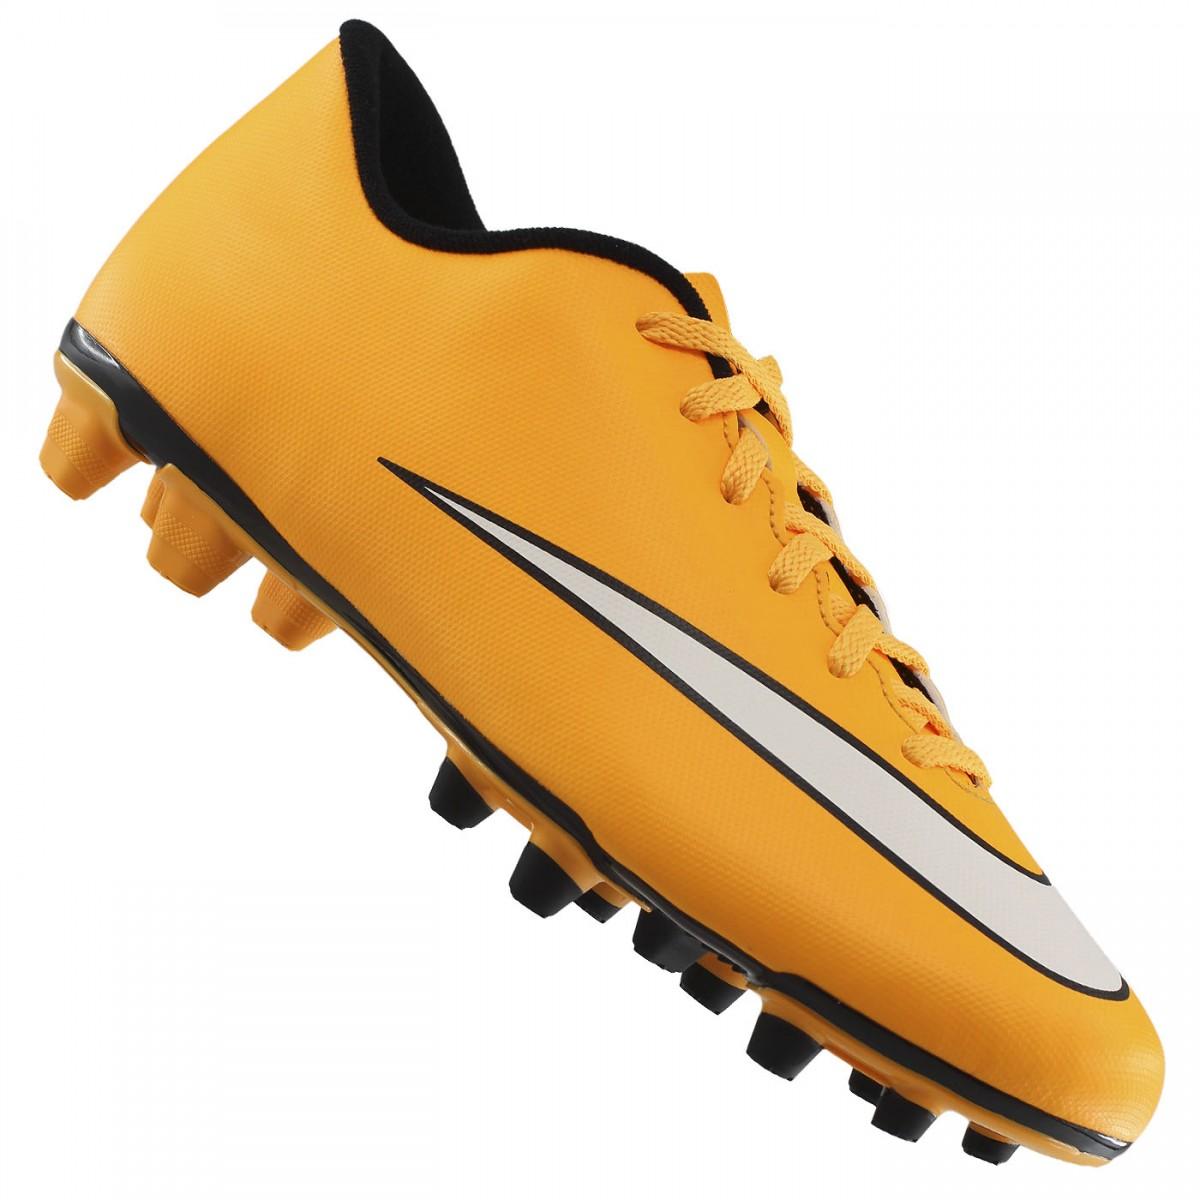 f86955b6240ac Chuteira Nike Mercurial Vortex II FG - Masculino